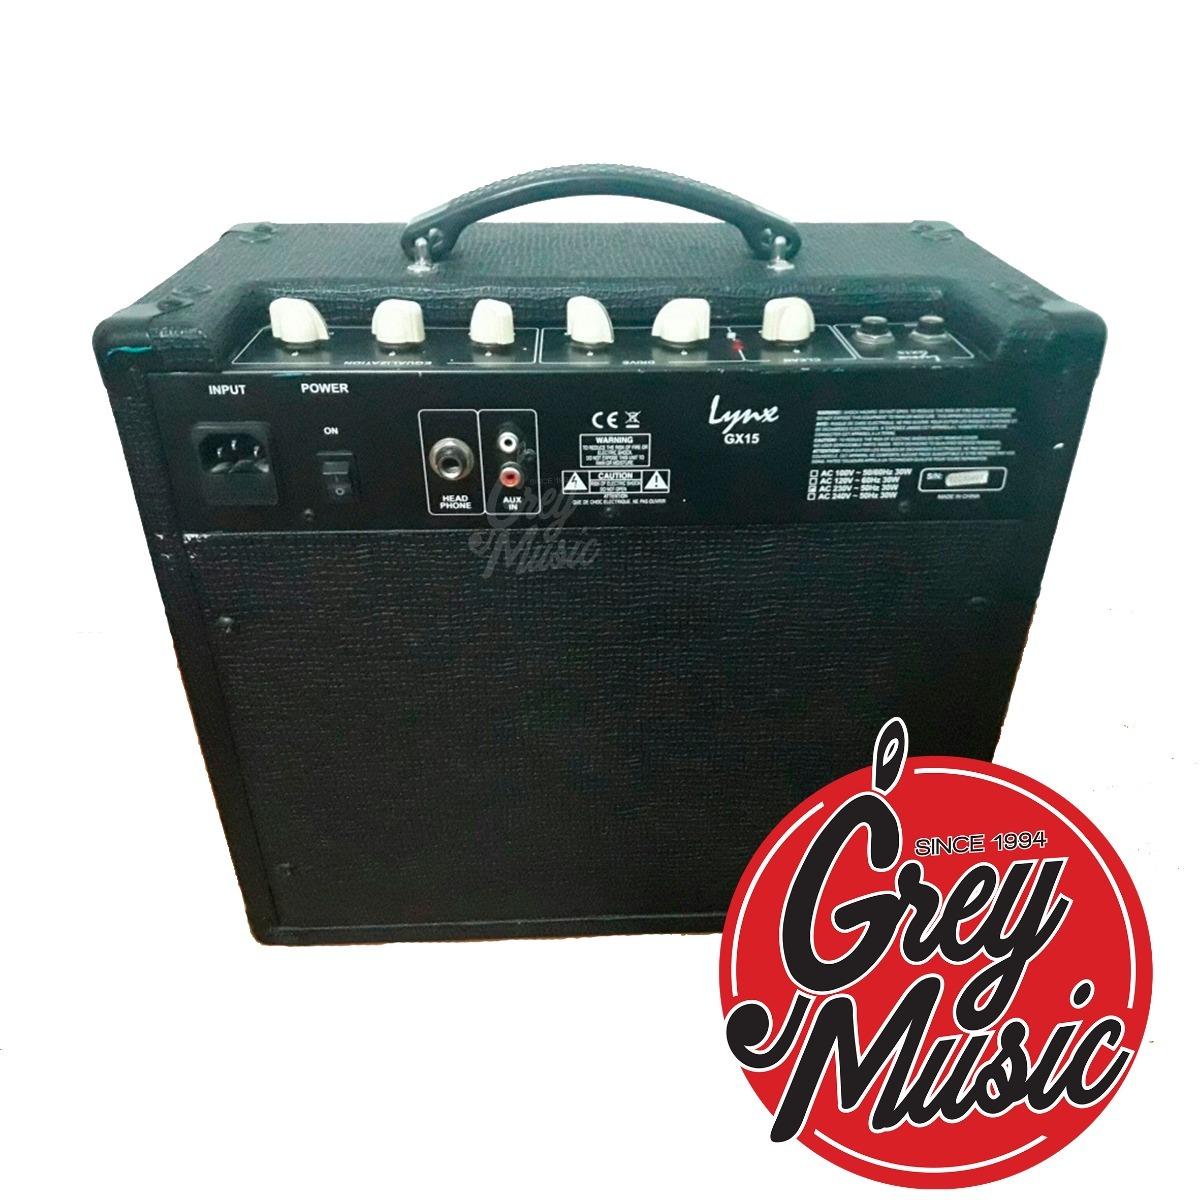 Amplificador Denver Lynx Gx15g Para Guitarra Electrica Grey